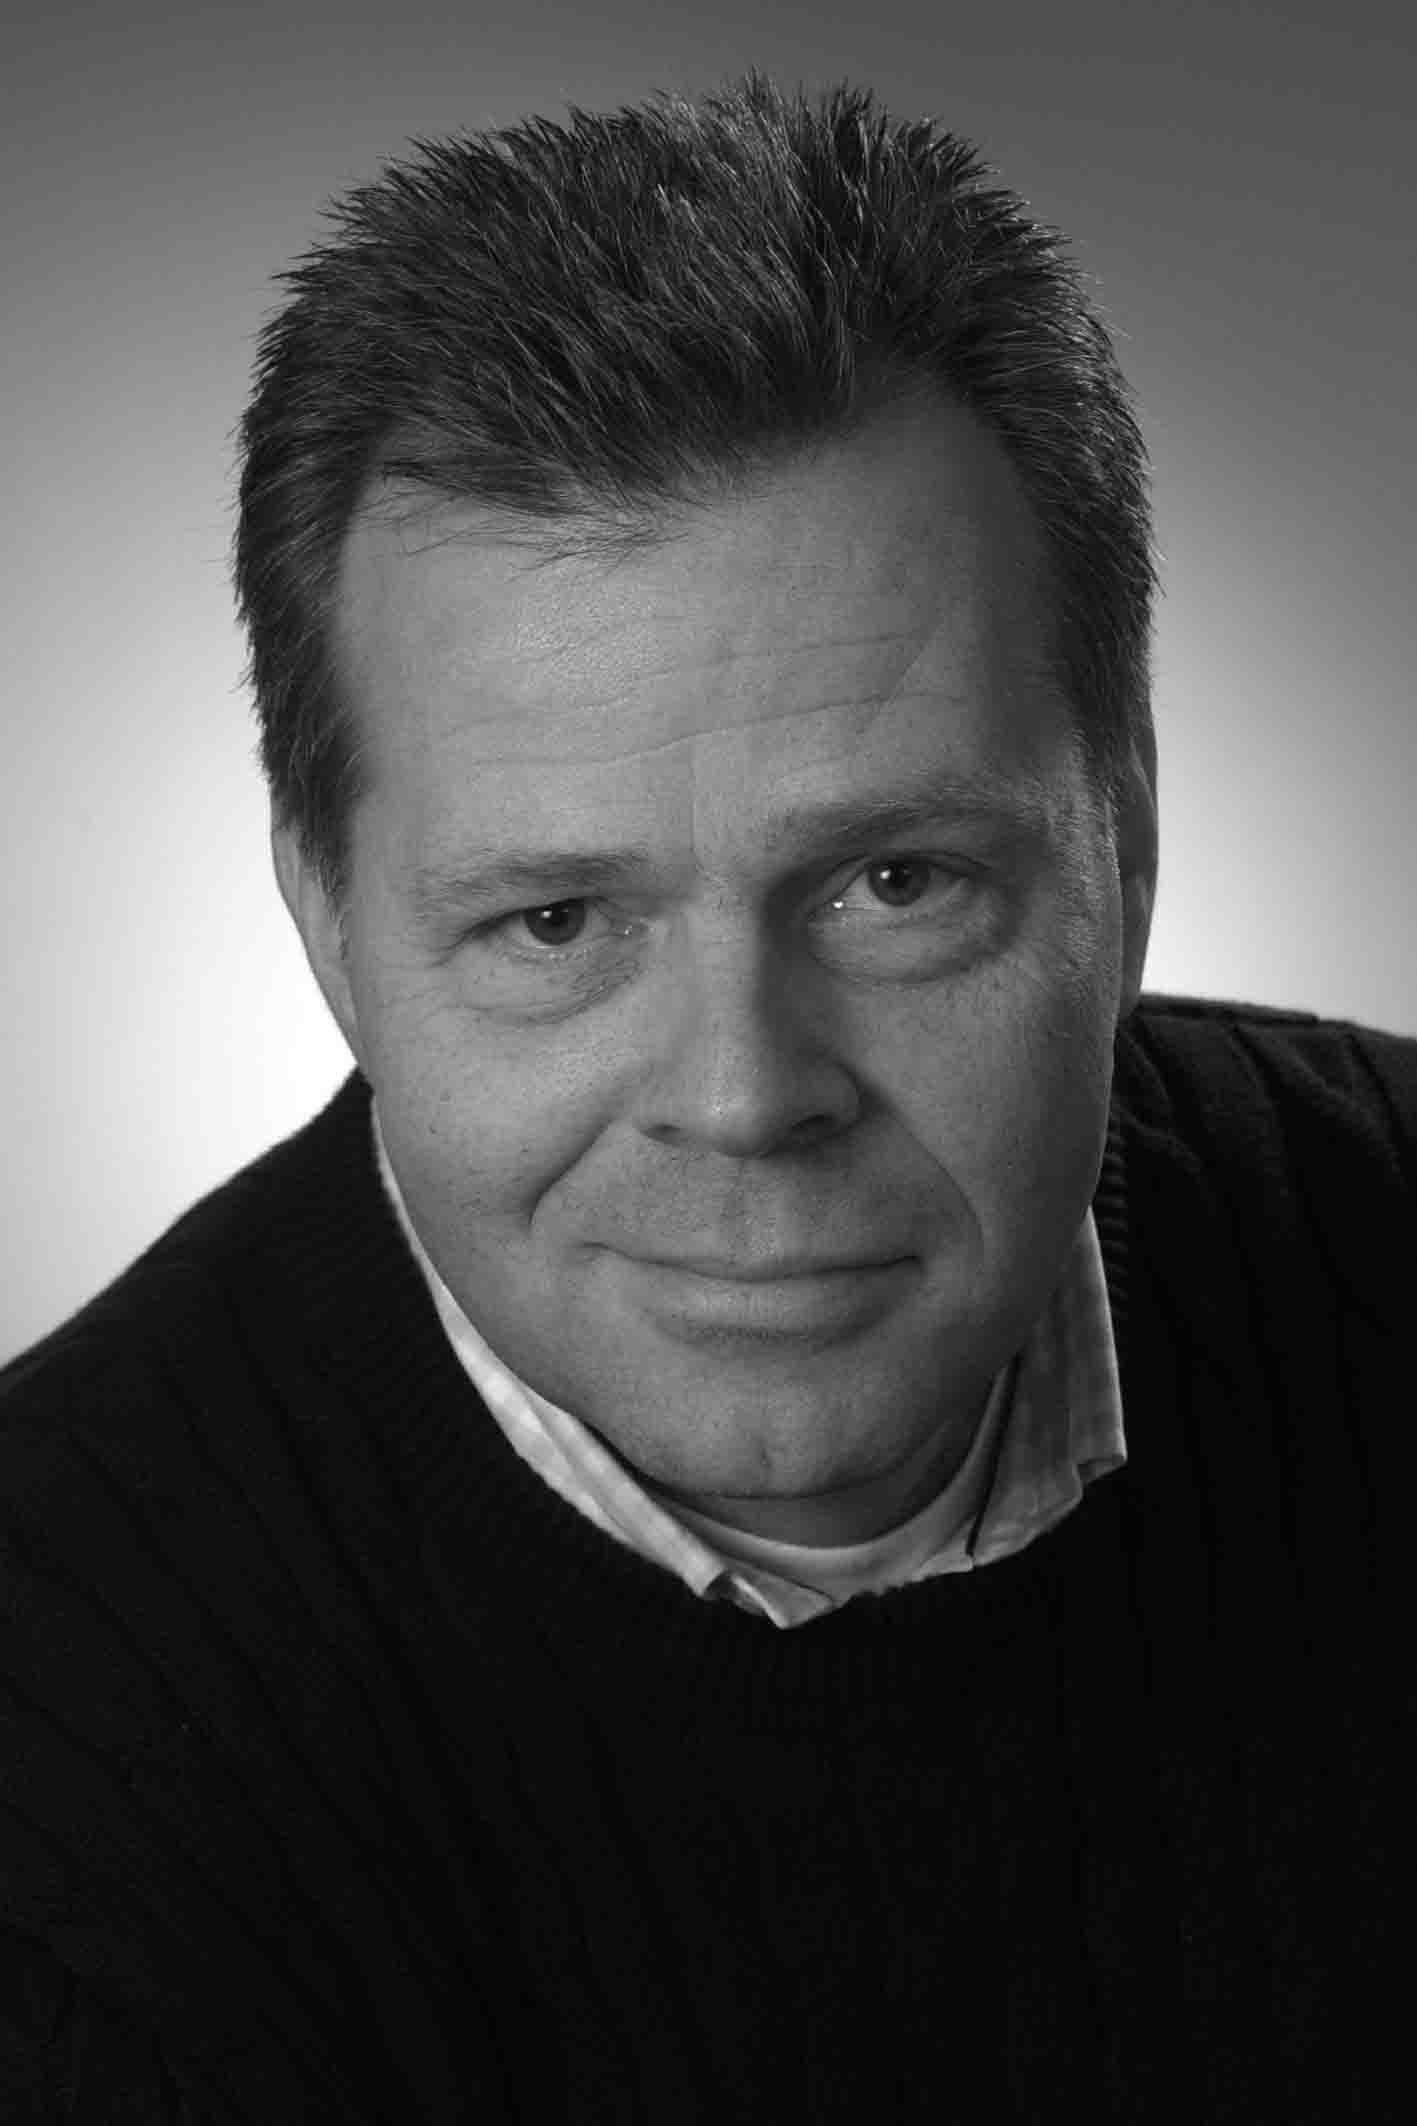 Michael Przybilowski